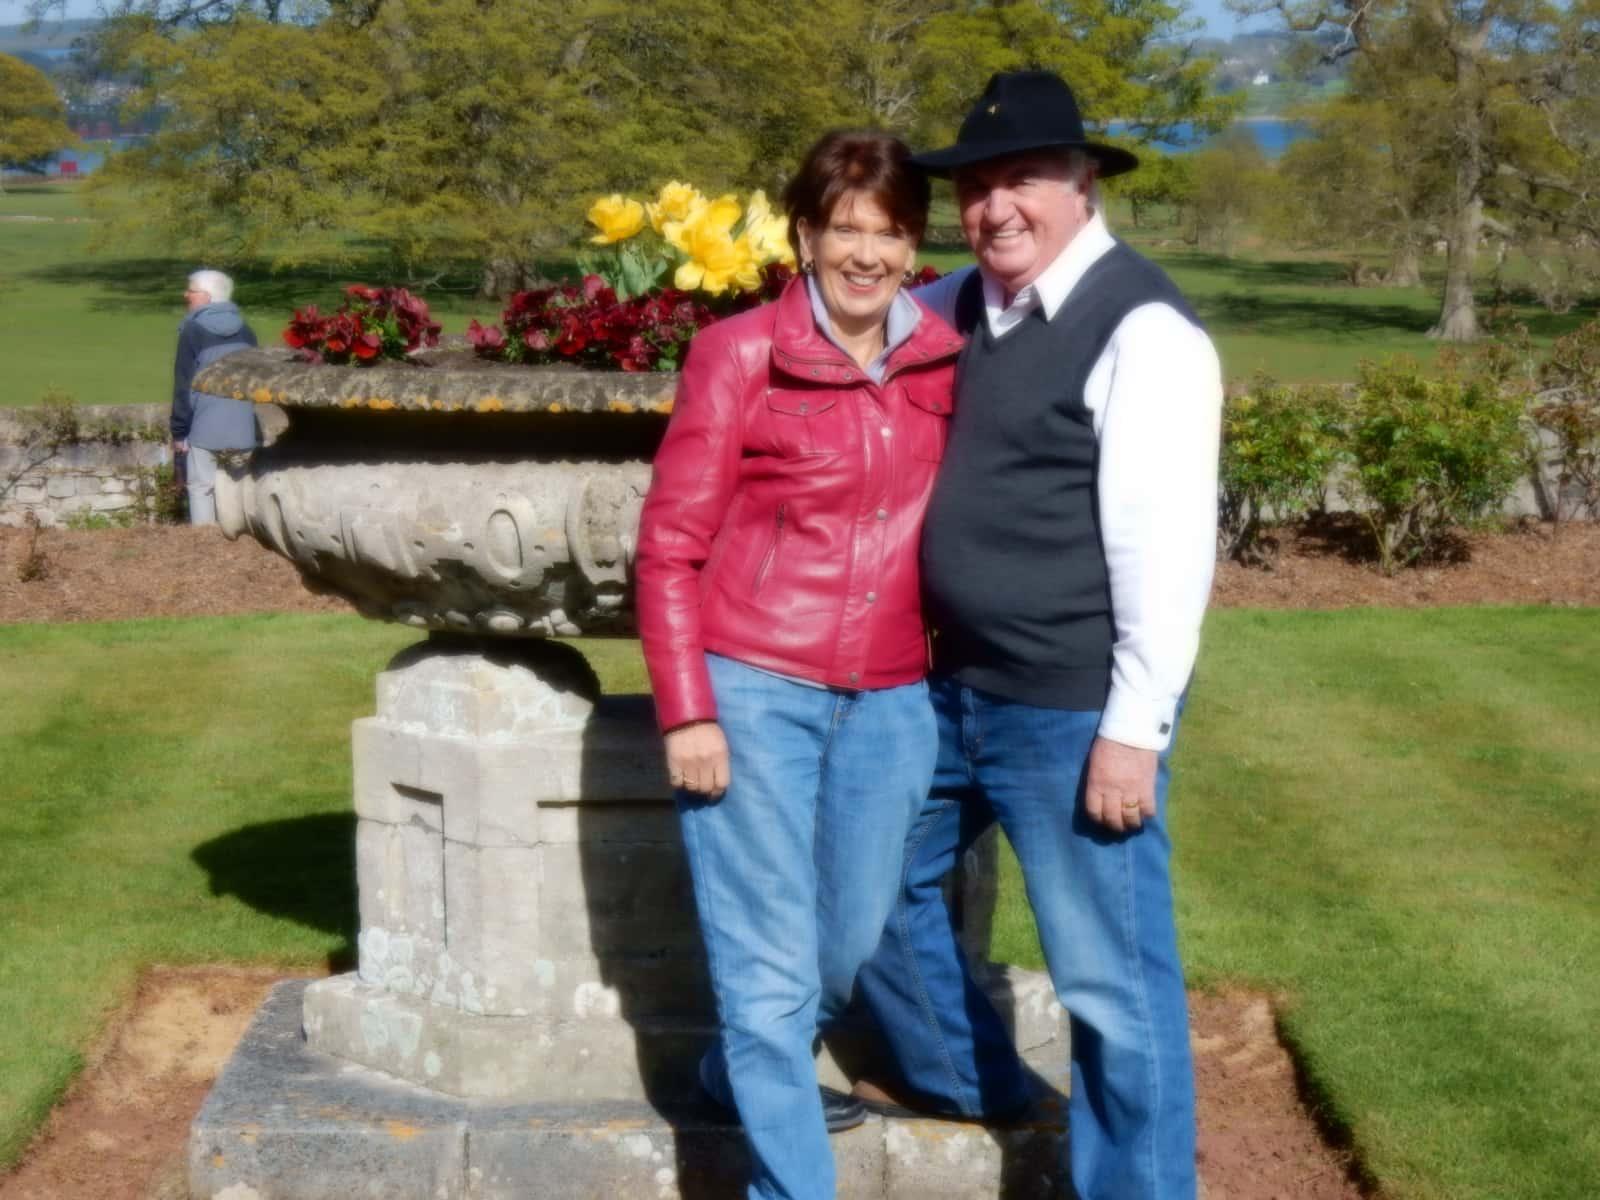 Barbara and gordon & Gordon from Sydney, New South Wales, Australia